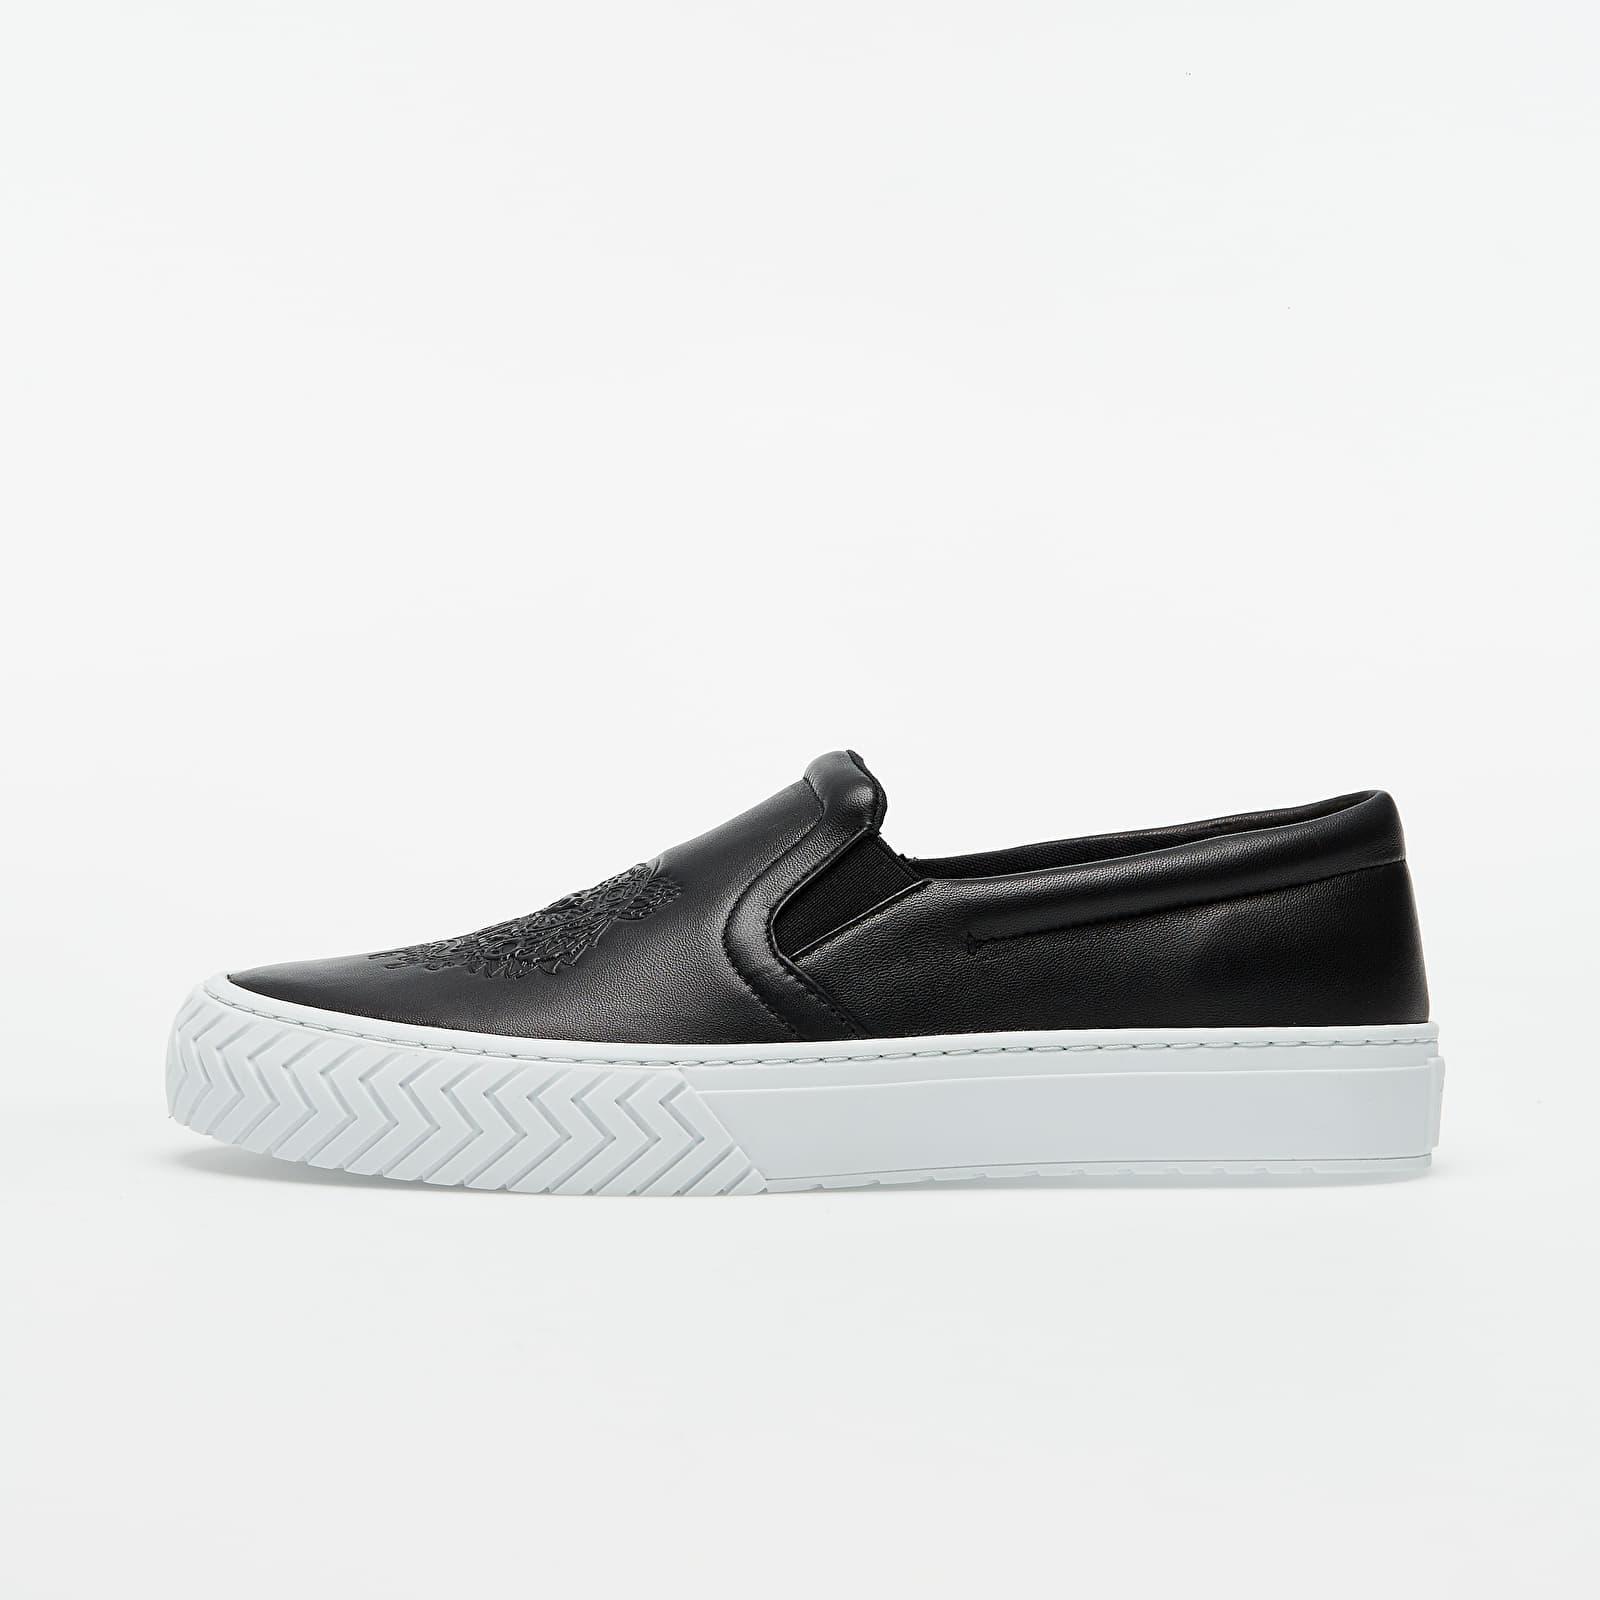 Women's shoes KENZO Slip-on sneaker Black